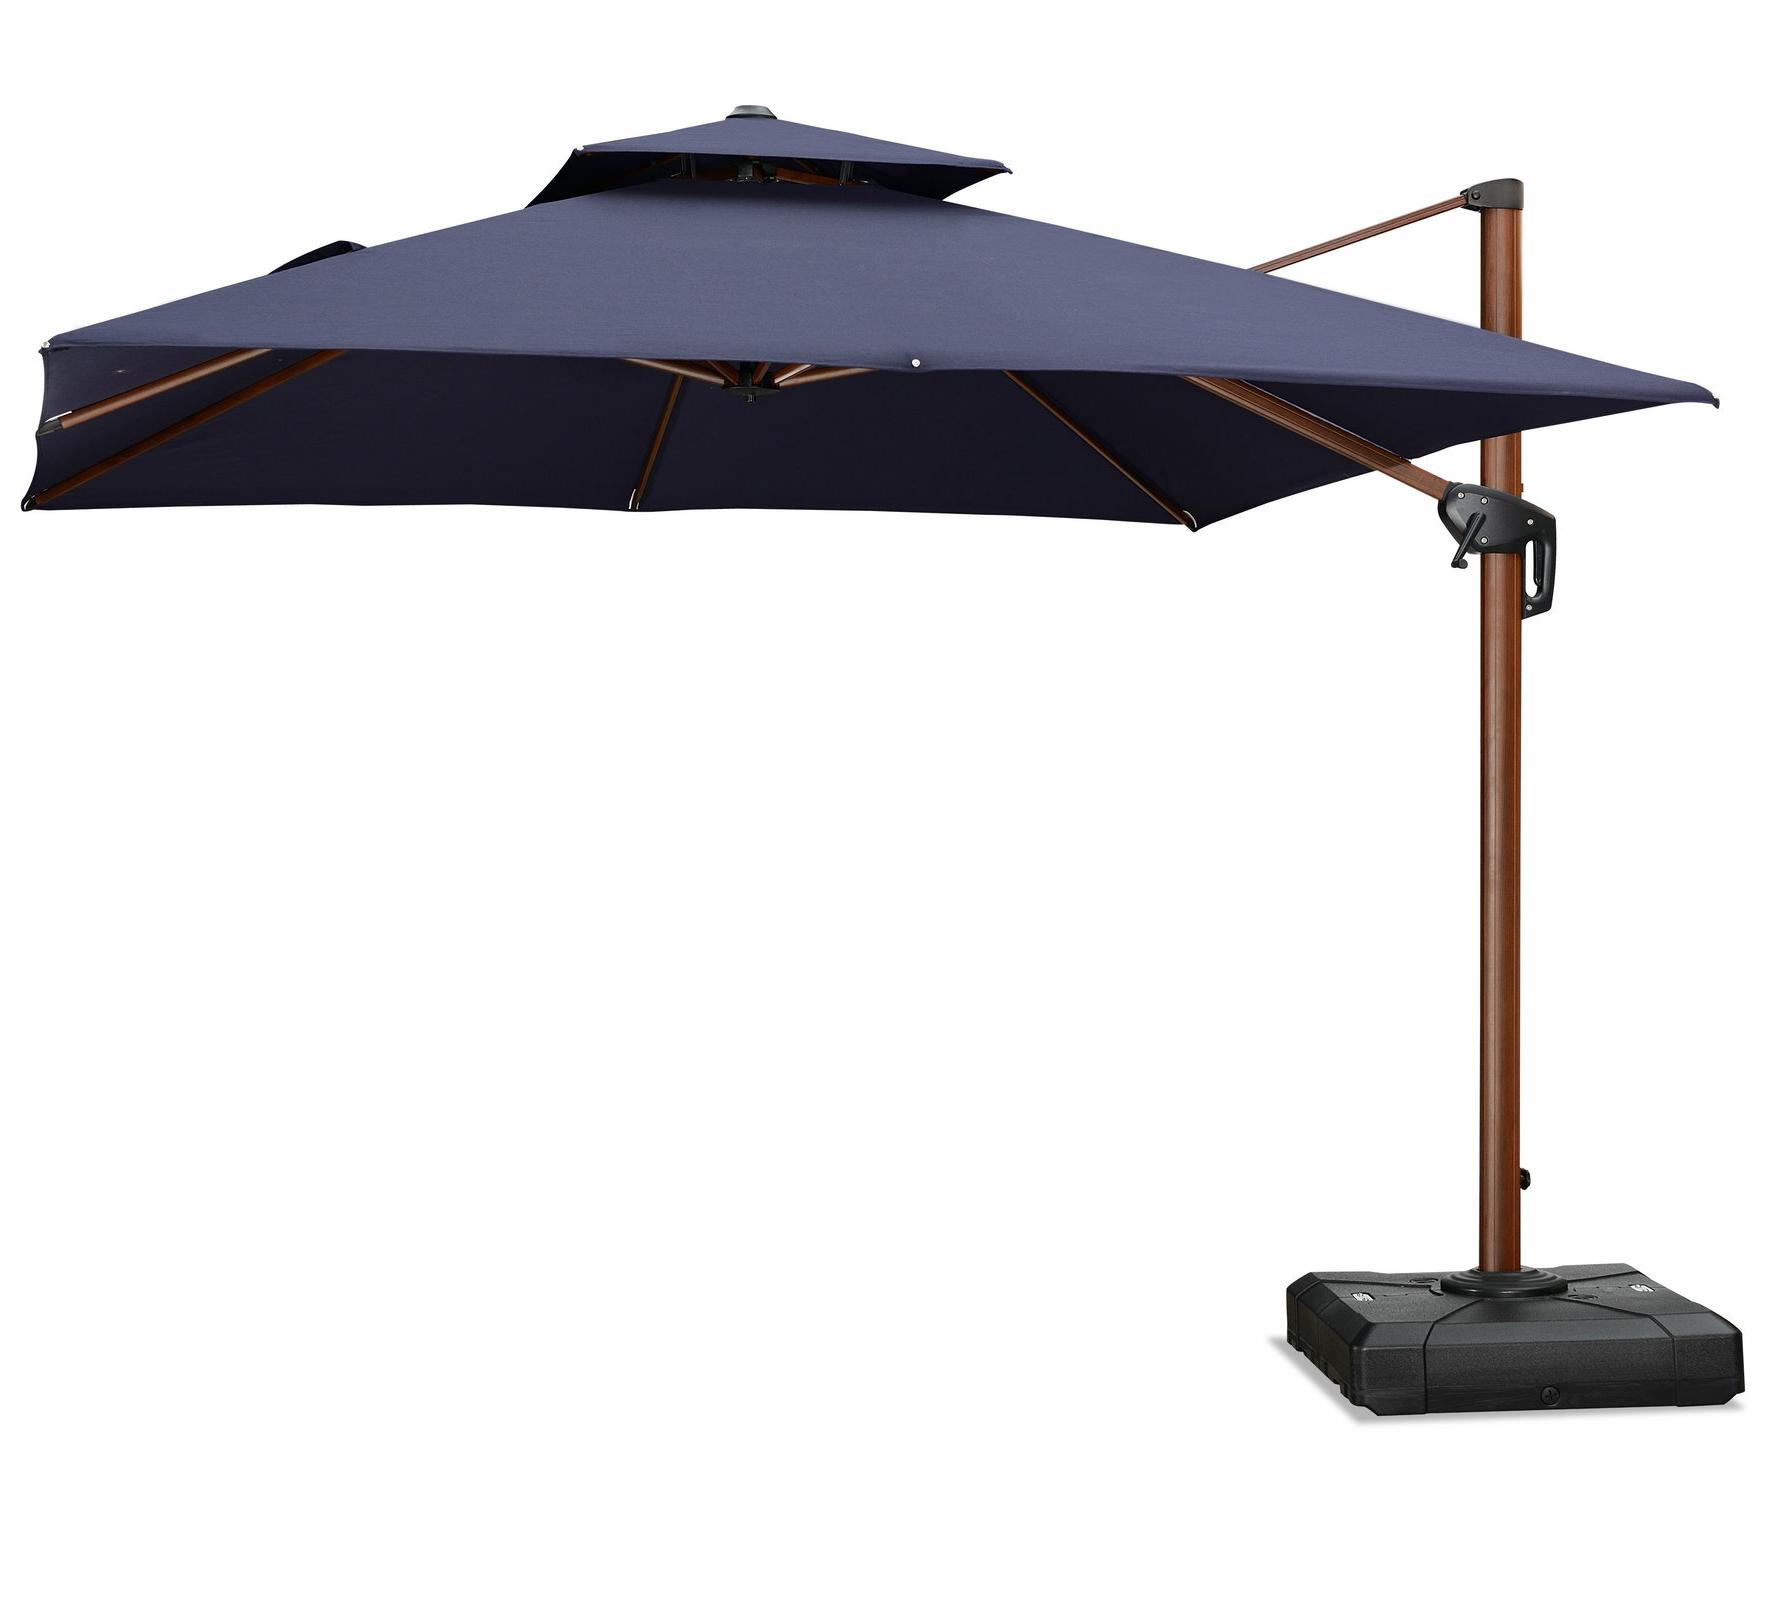 2019 Spitler Square Cantilever Umbrellas Regarding Waddell 10' Square Cantilever Umbrella (Gallery 7 of 20)